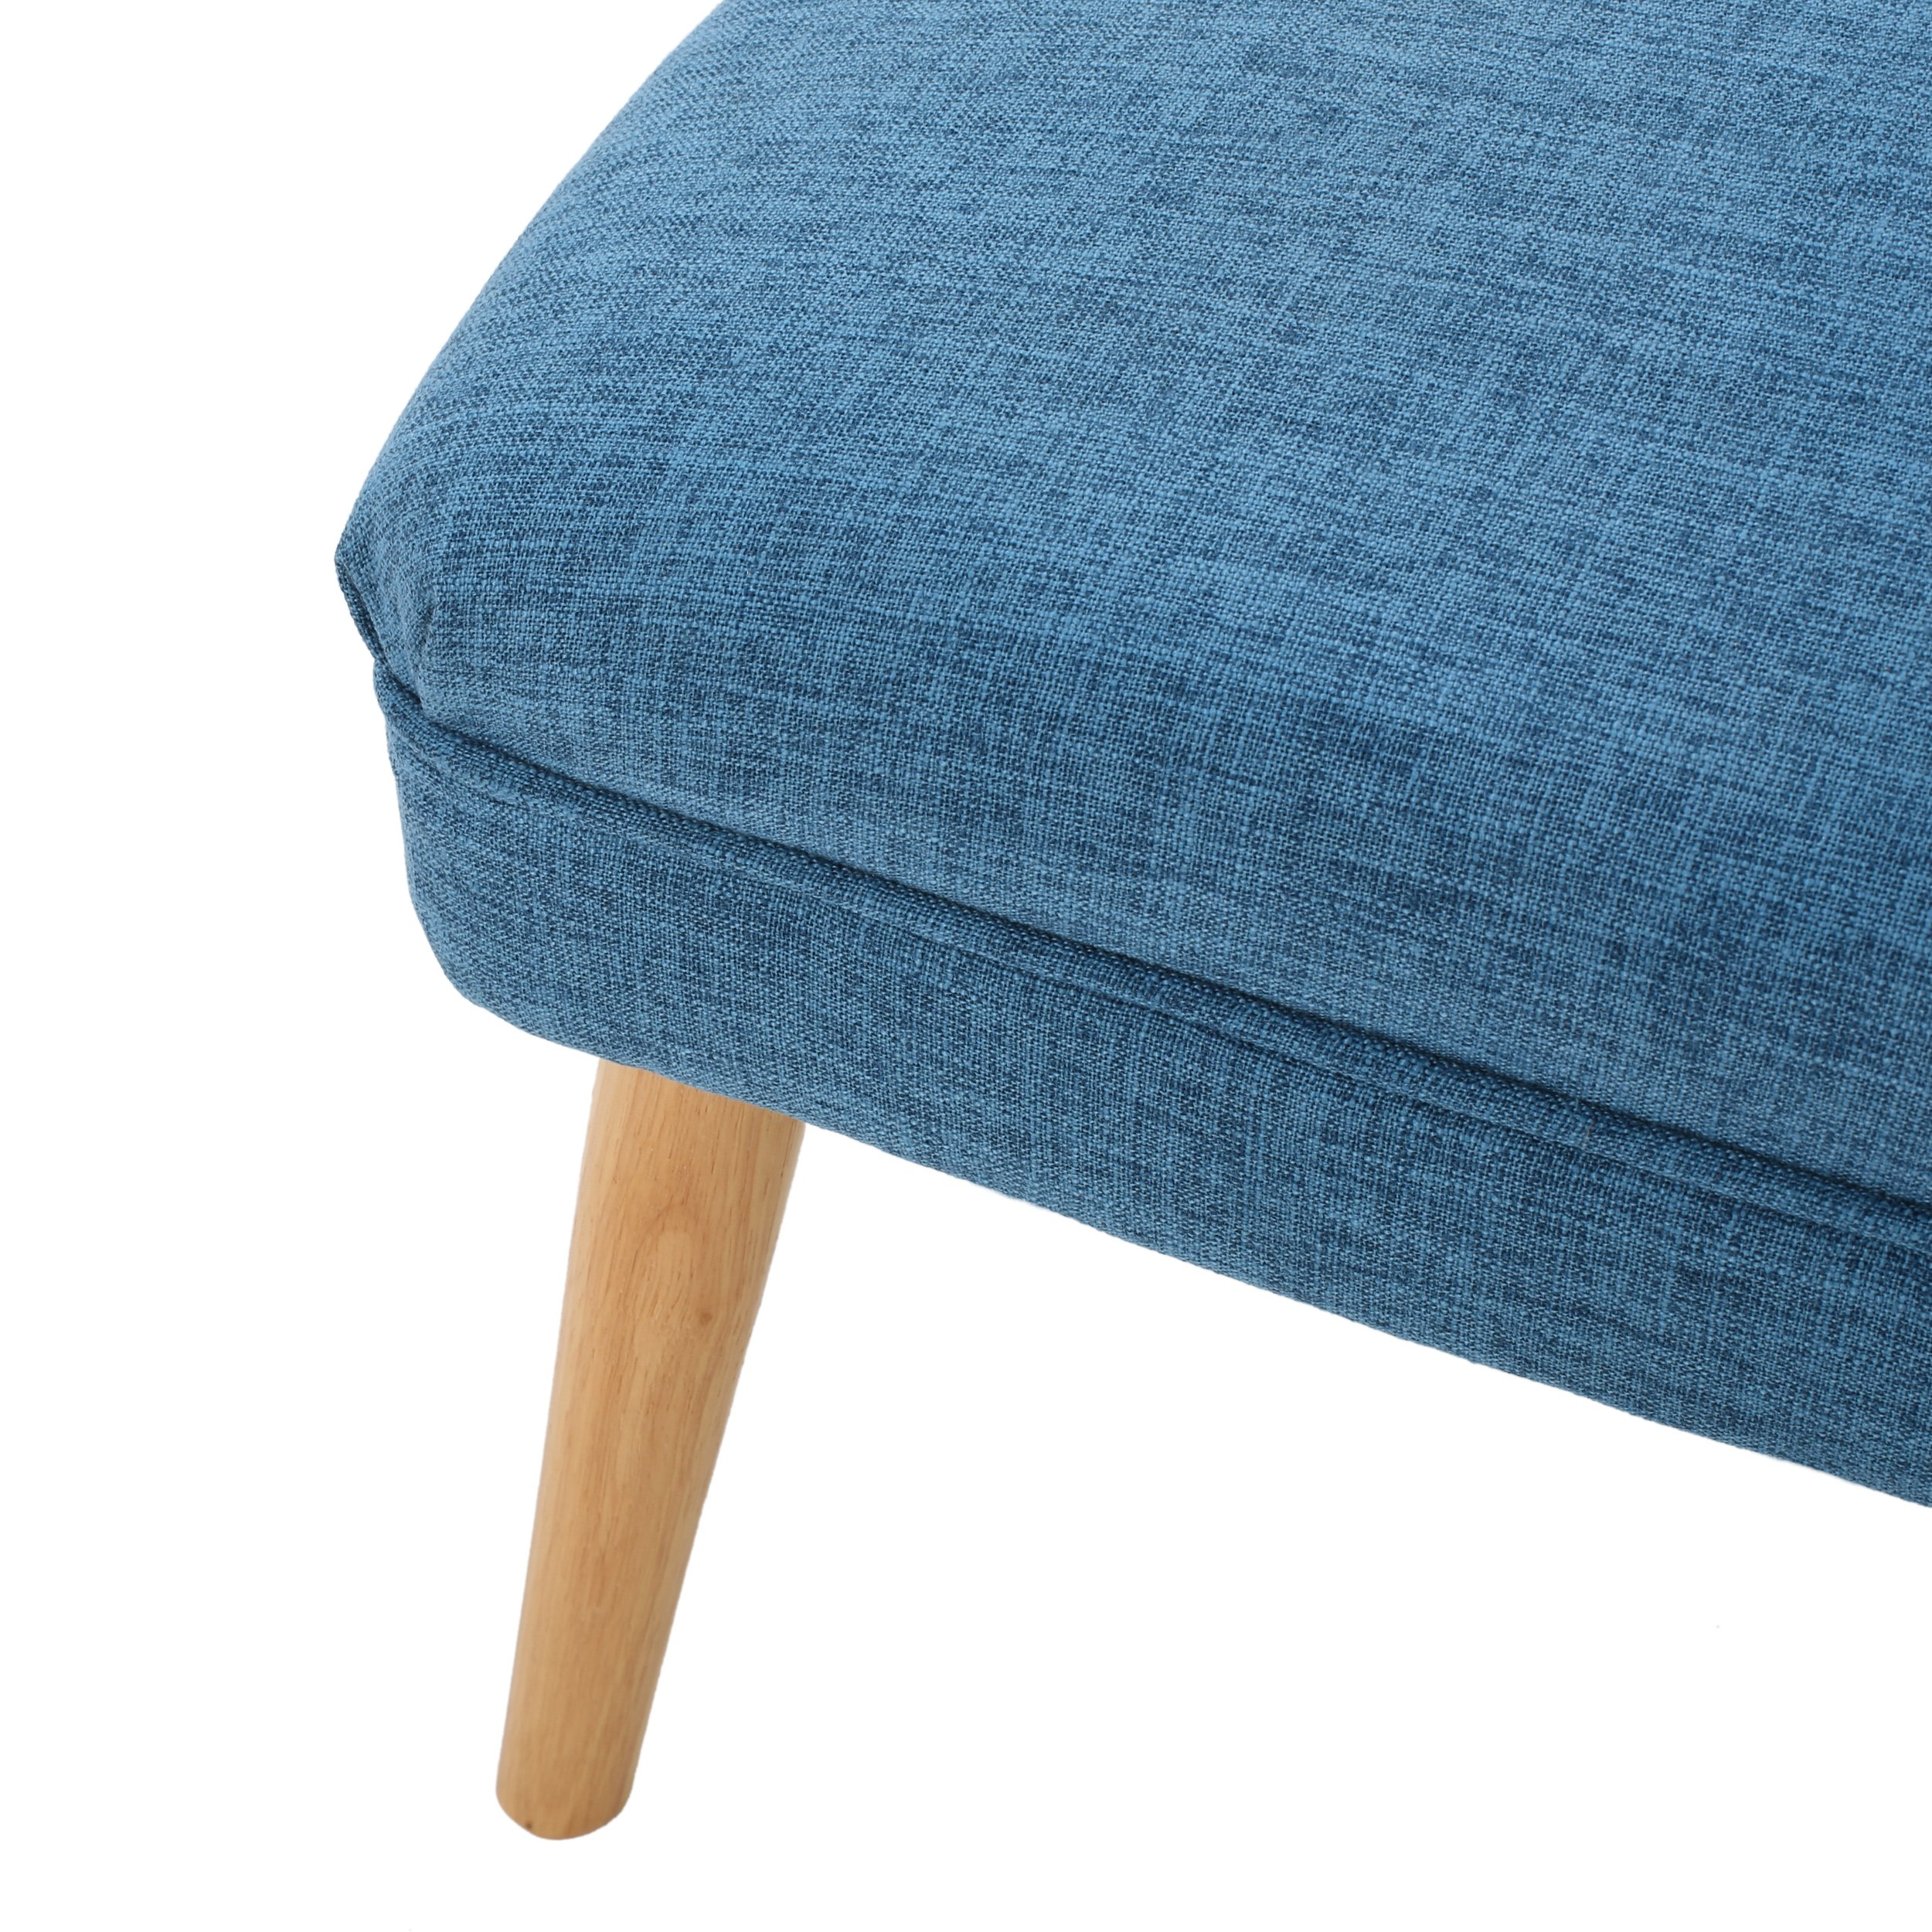 Dumont Mid Century Modern Fabric Ottoman (Blue) by GDF Studio (Image #4)